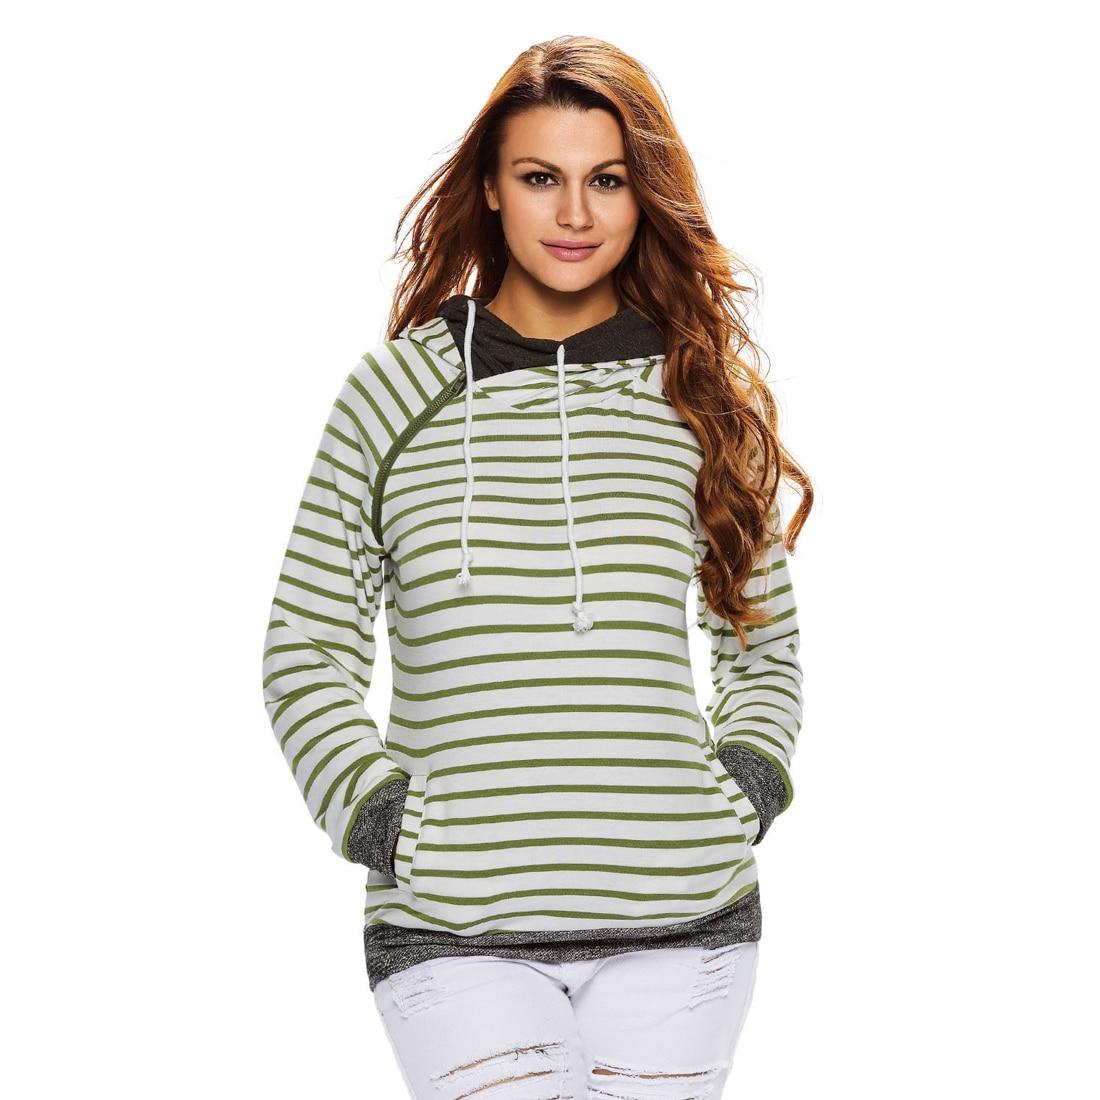 YJSFG HOUSE Sexy Women Coat Zipper Long Sleeve Hoodie Jumper Pullover Sweatshirt Pocket Shirt Striped Autumn Outwear Jacket Home